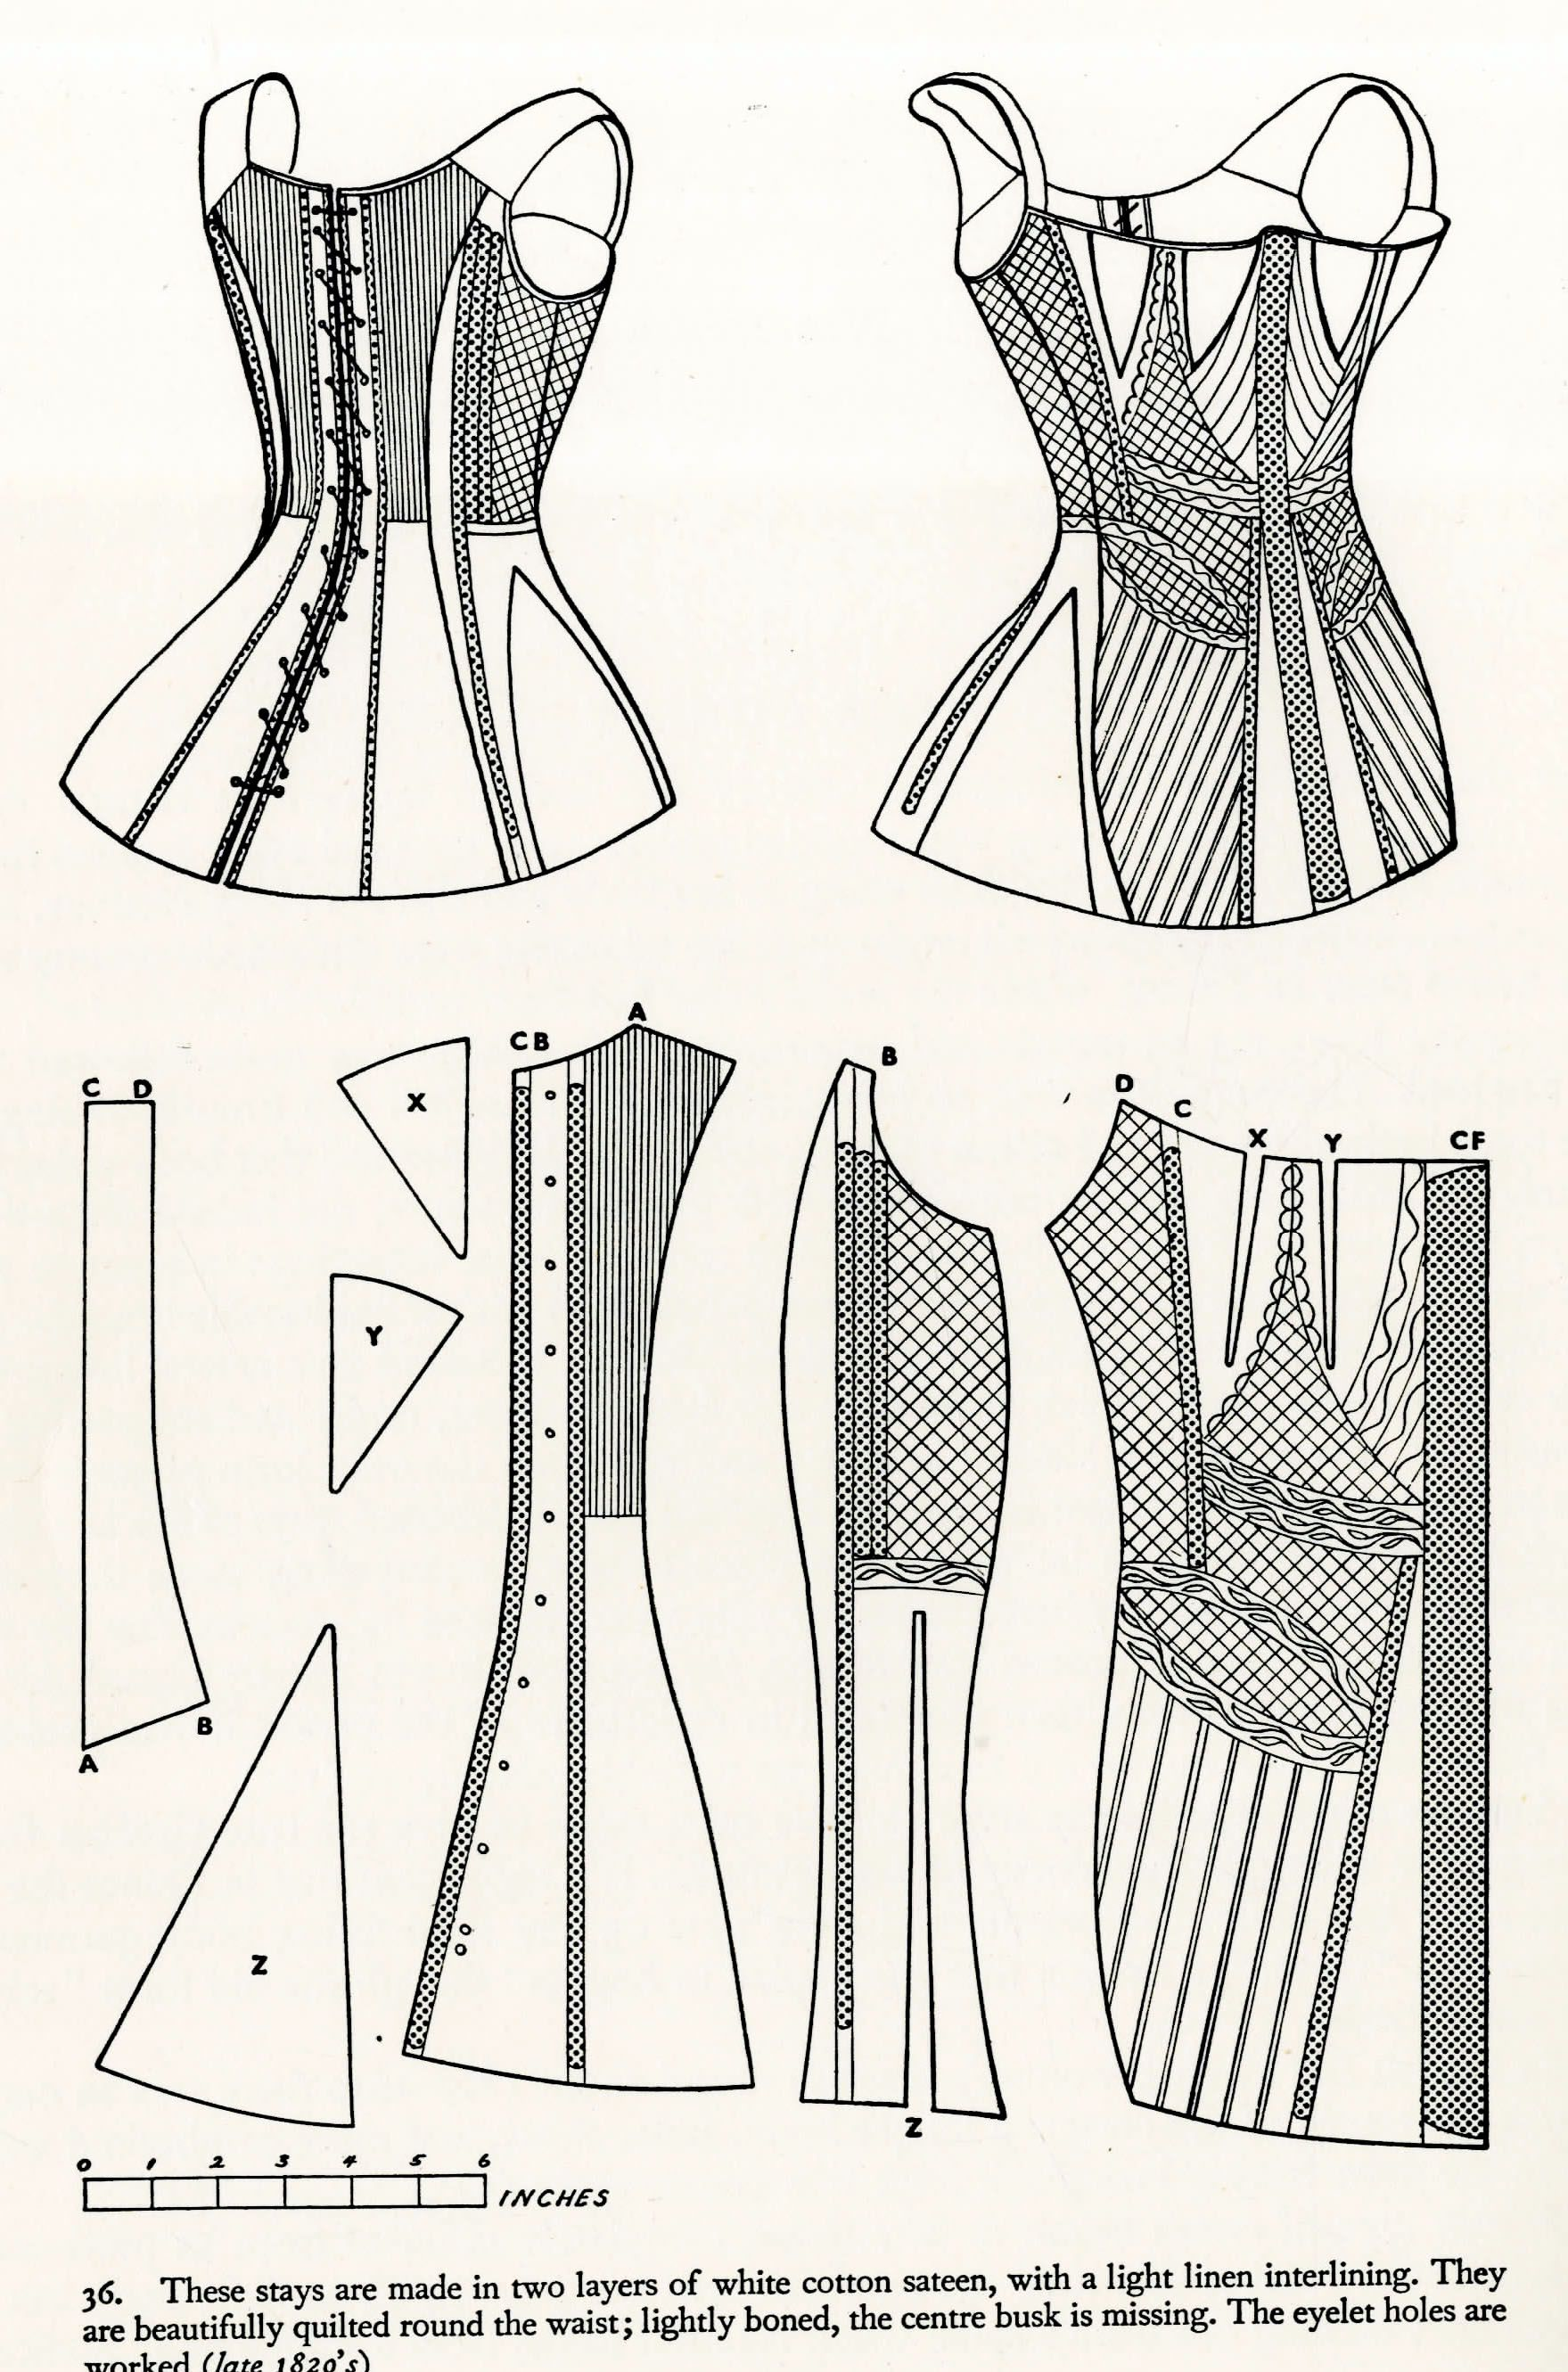 1820er Schnürbrust | Biedermeier: Kleiderstudien | Pinterest ...